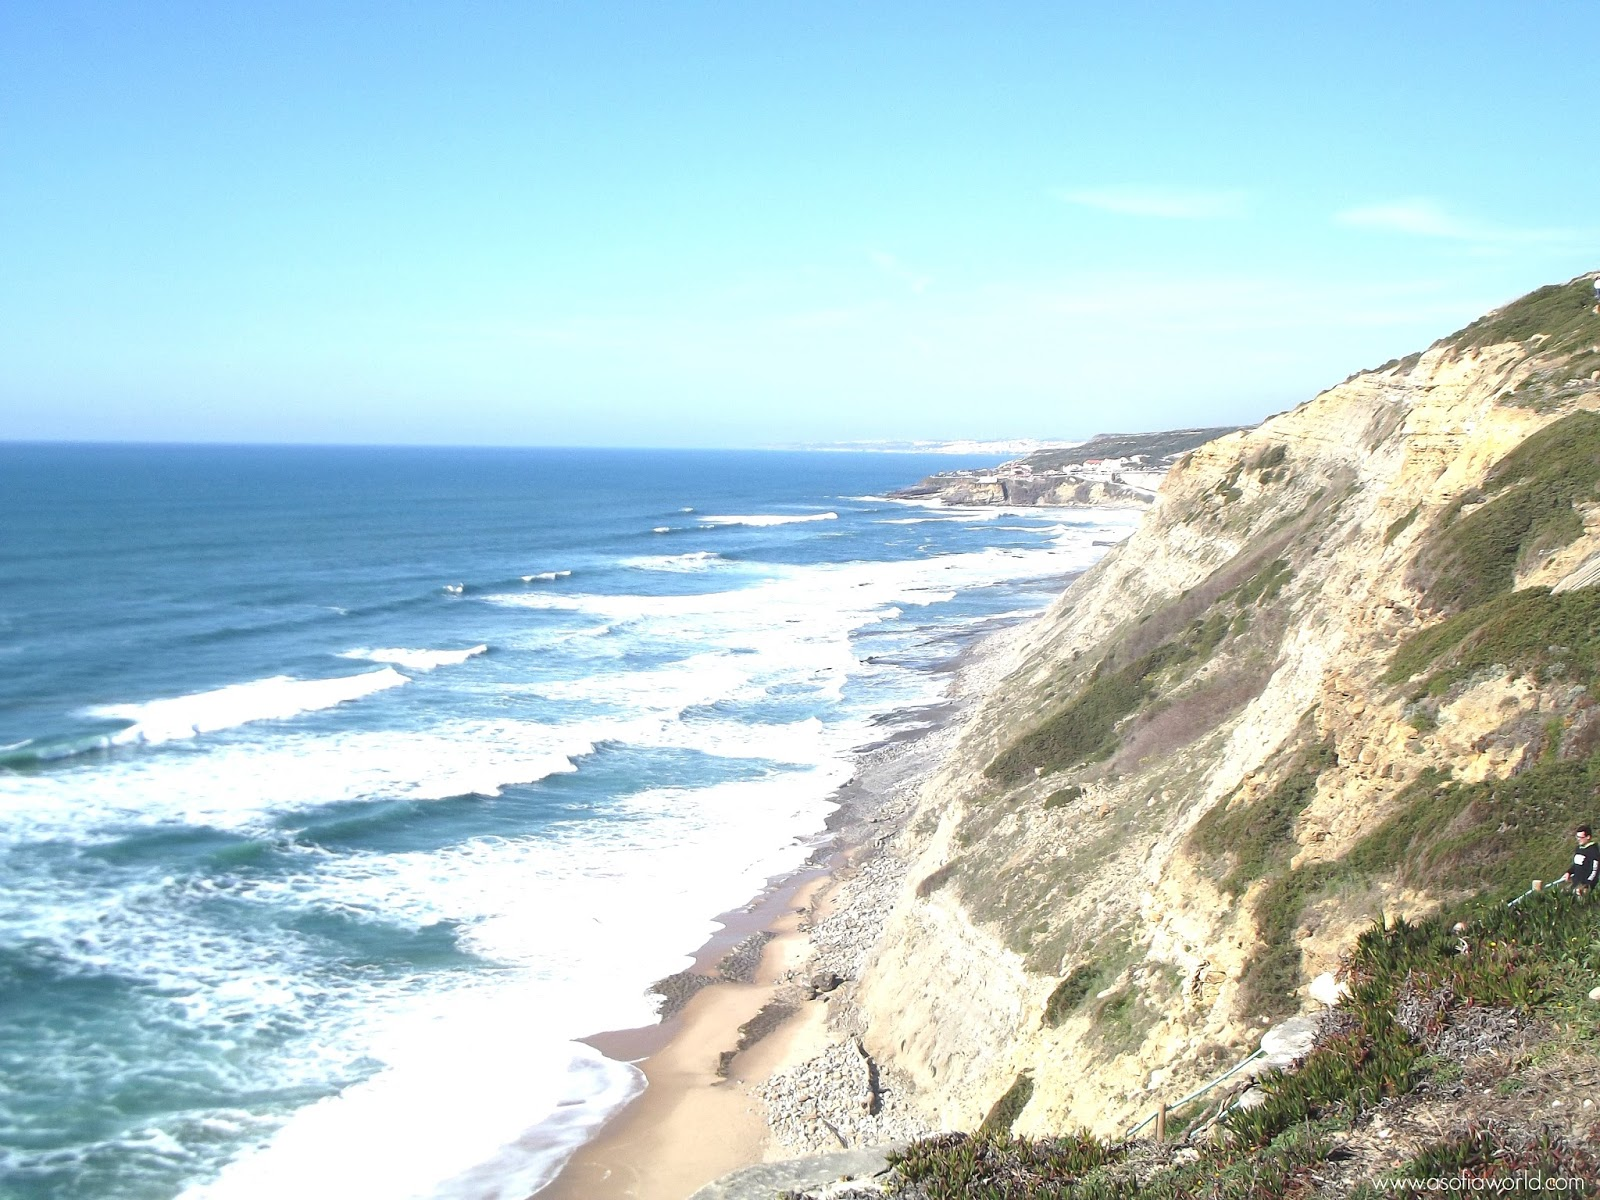 Praia da Aguda e Praia da Adraga, Sintra